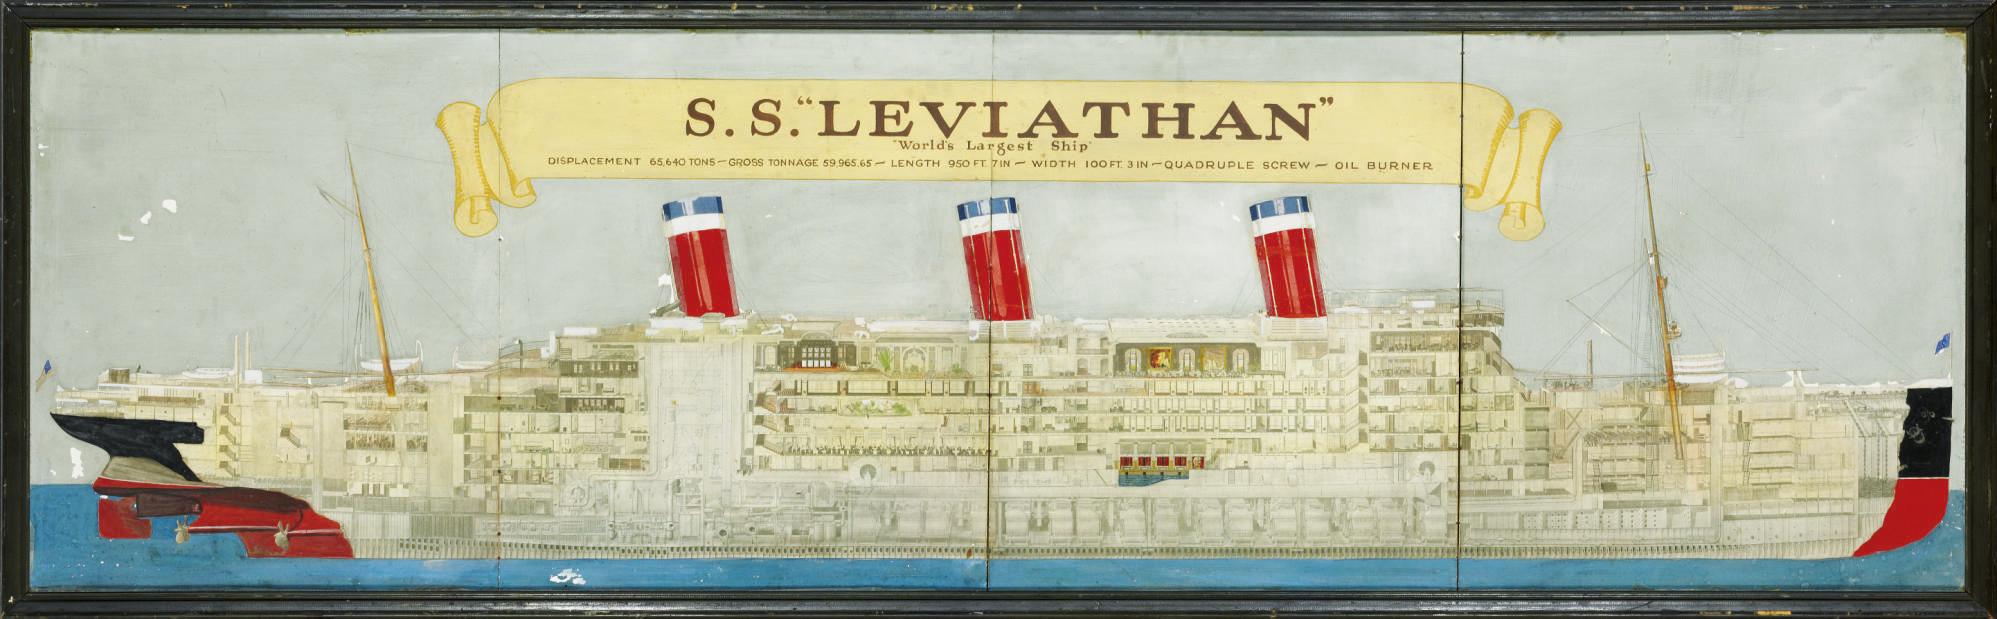 S.S. Leviathan